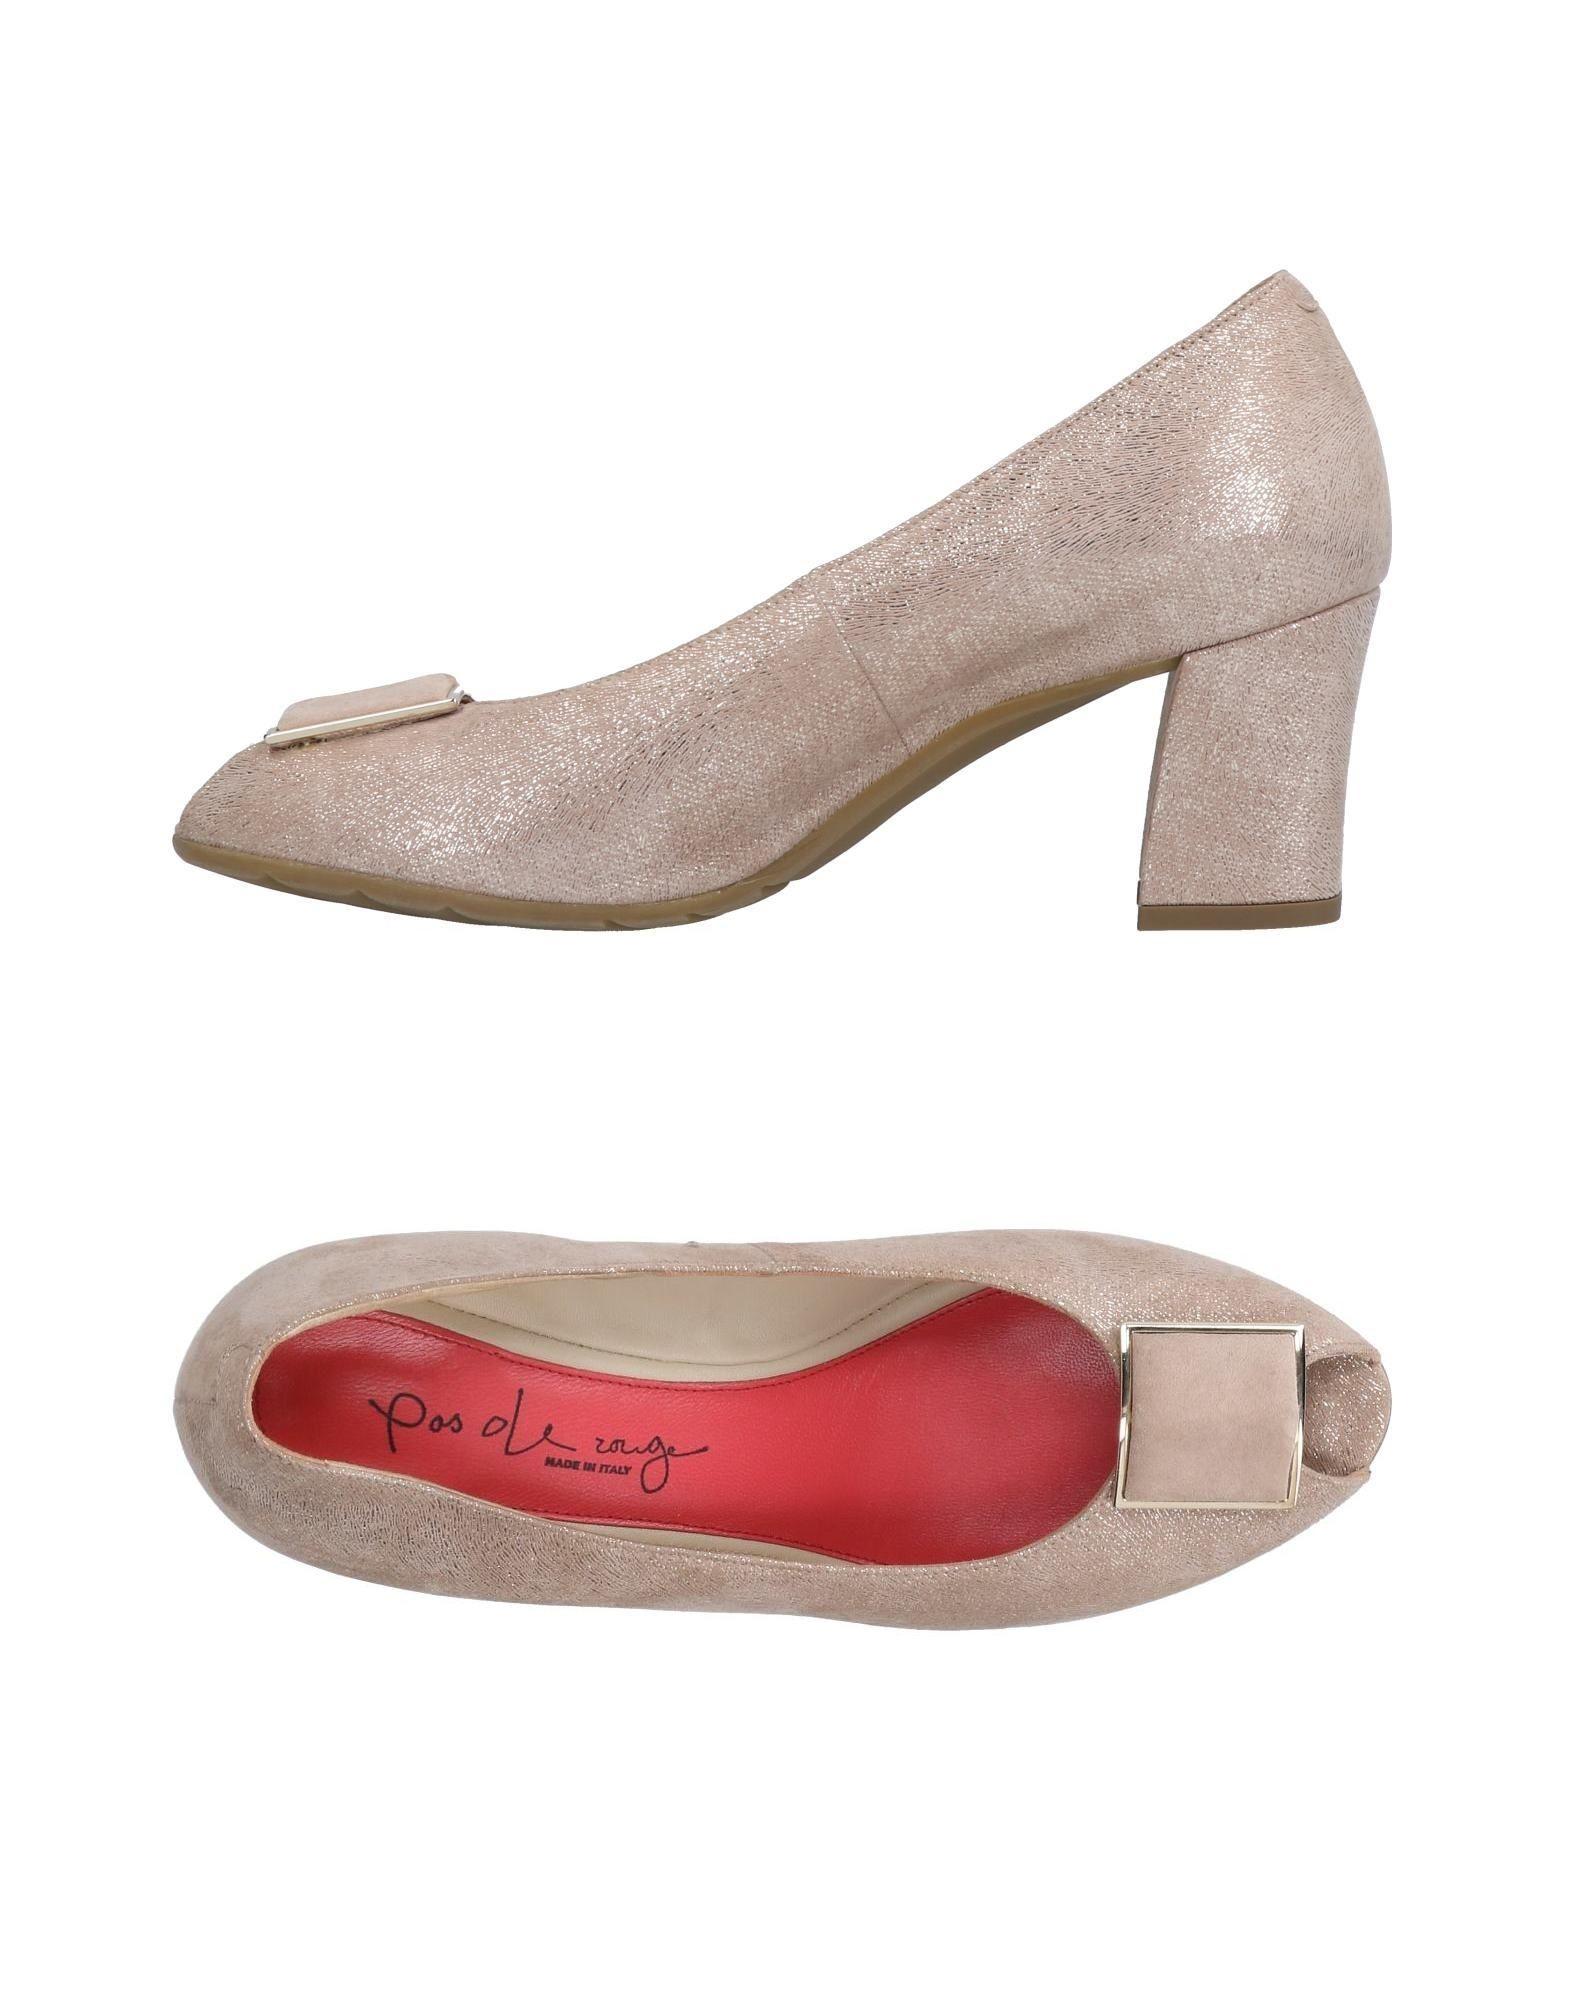 Stilvolle billige Schuhe Pas De Rouge Pumps Damen Damen Damen  11503977VS 441405